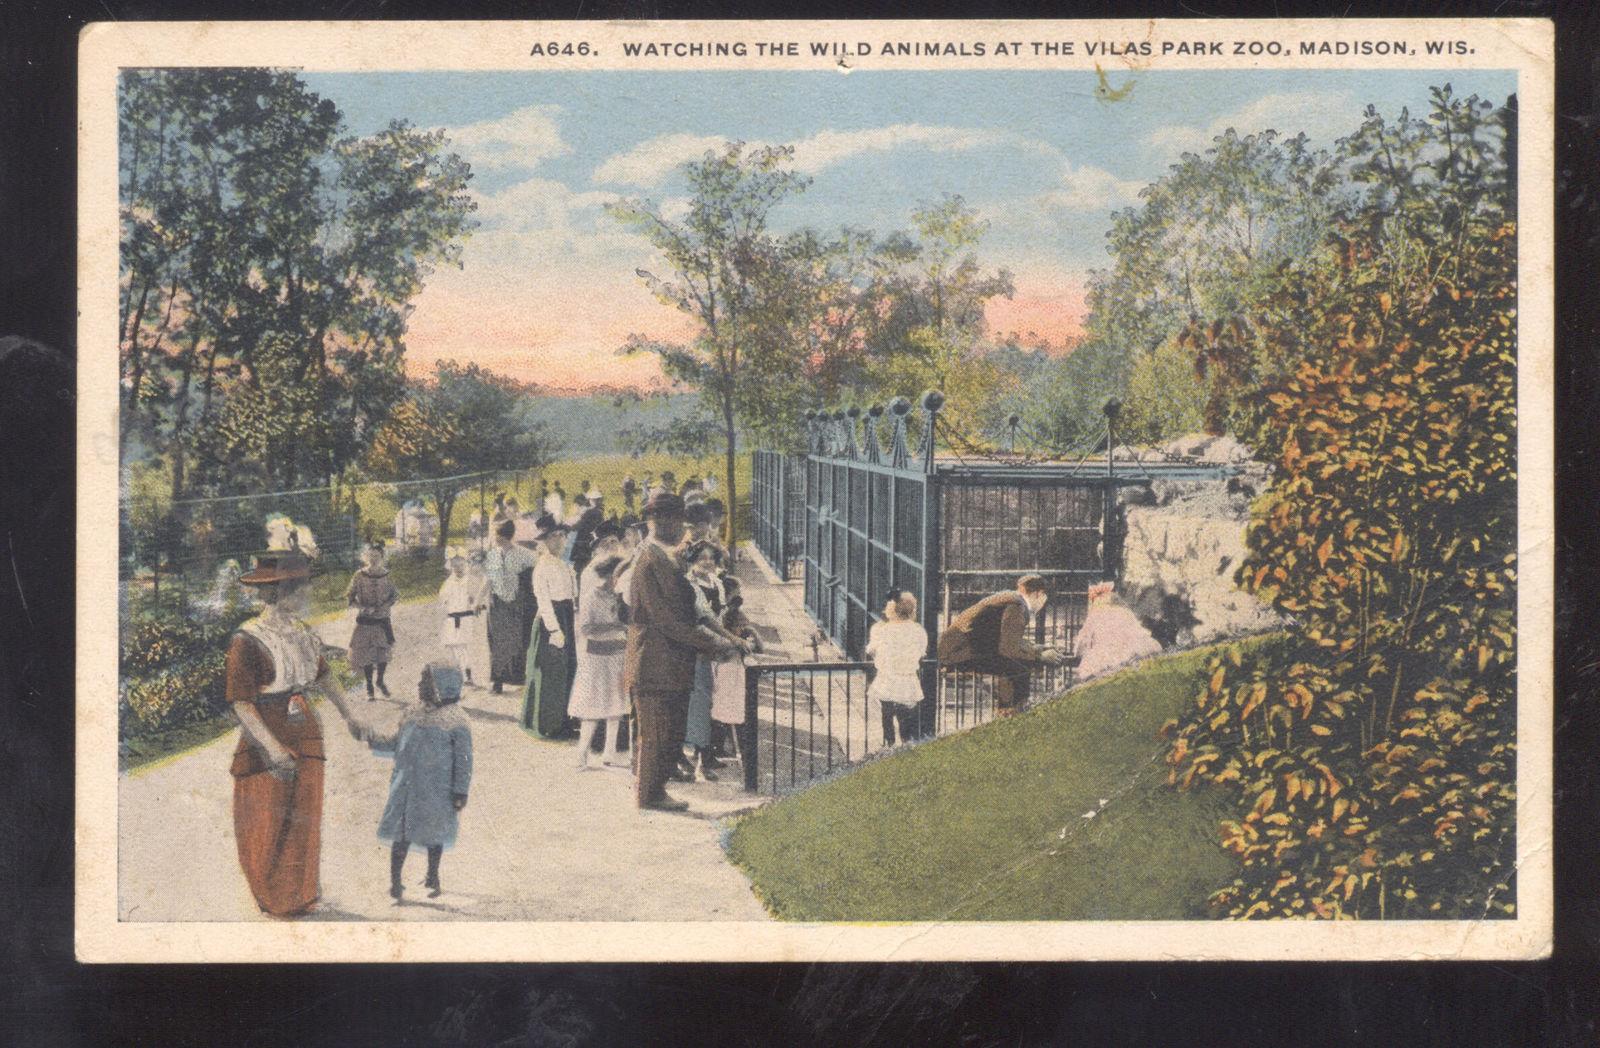 Spring In Vilas Park >> Madison Wisconsin Vilas Park Zoo Vintage Postcard Spring Valley Wis